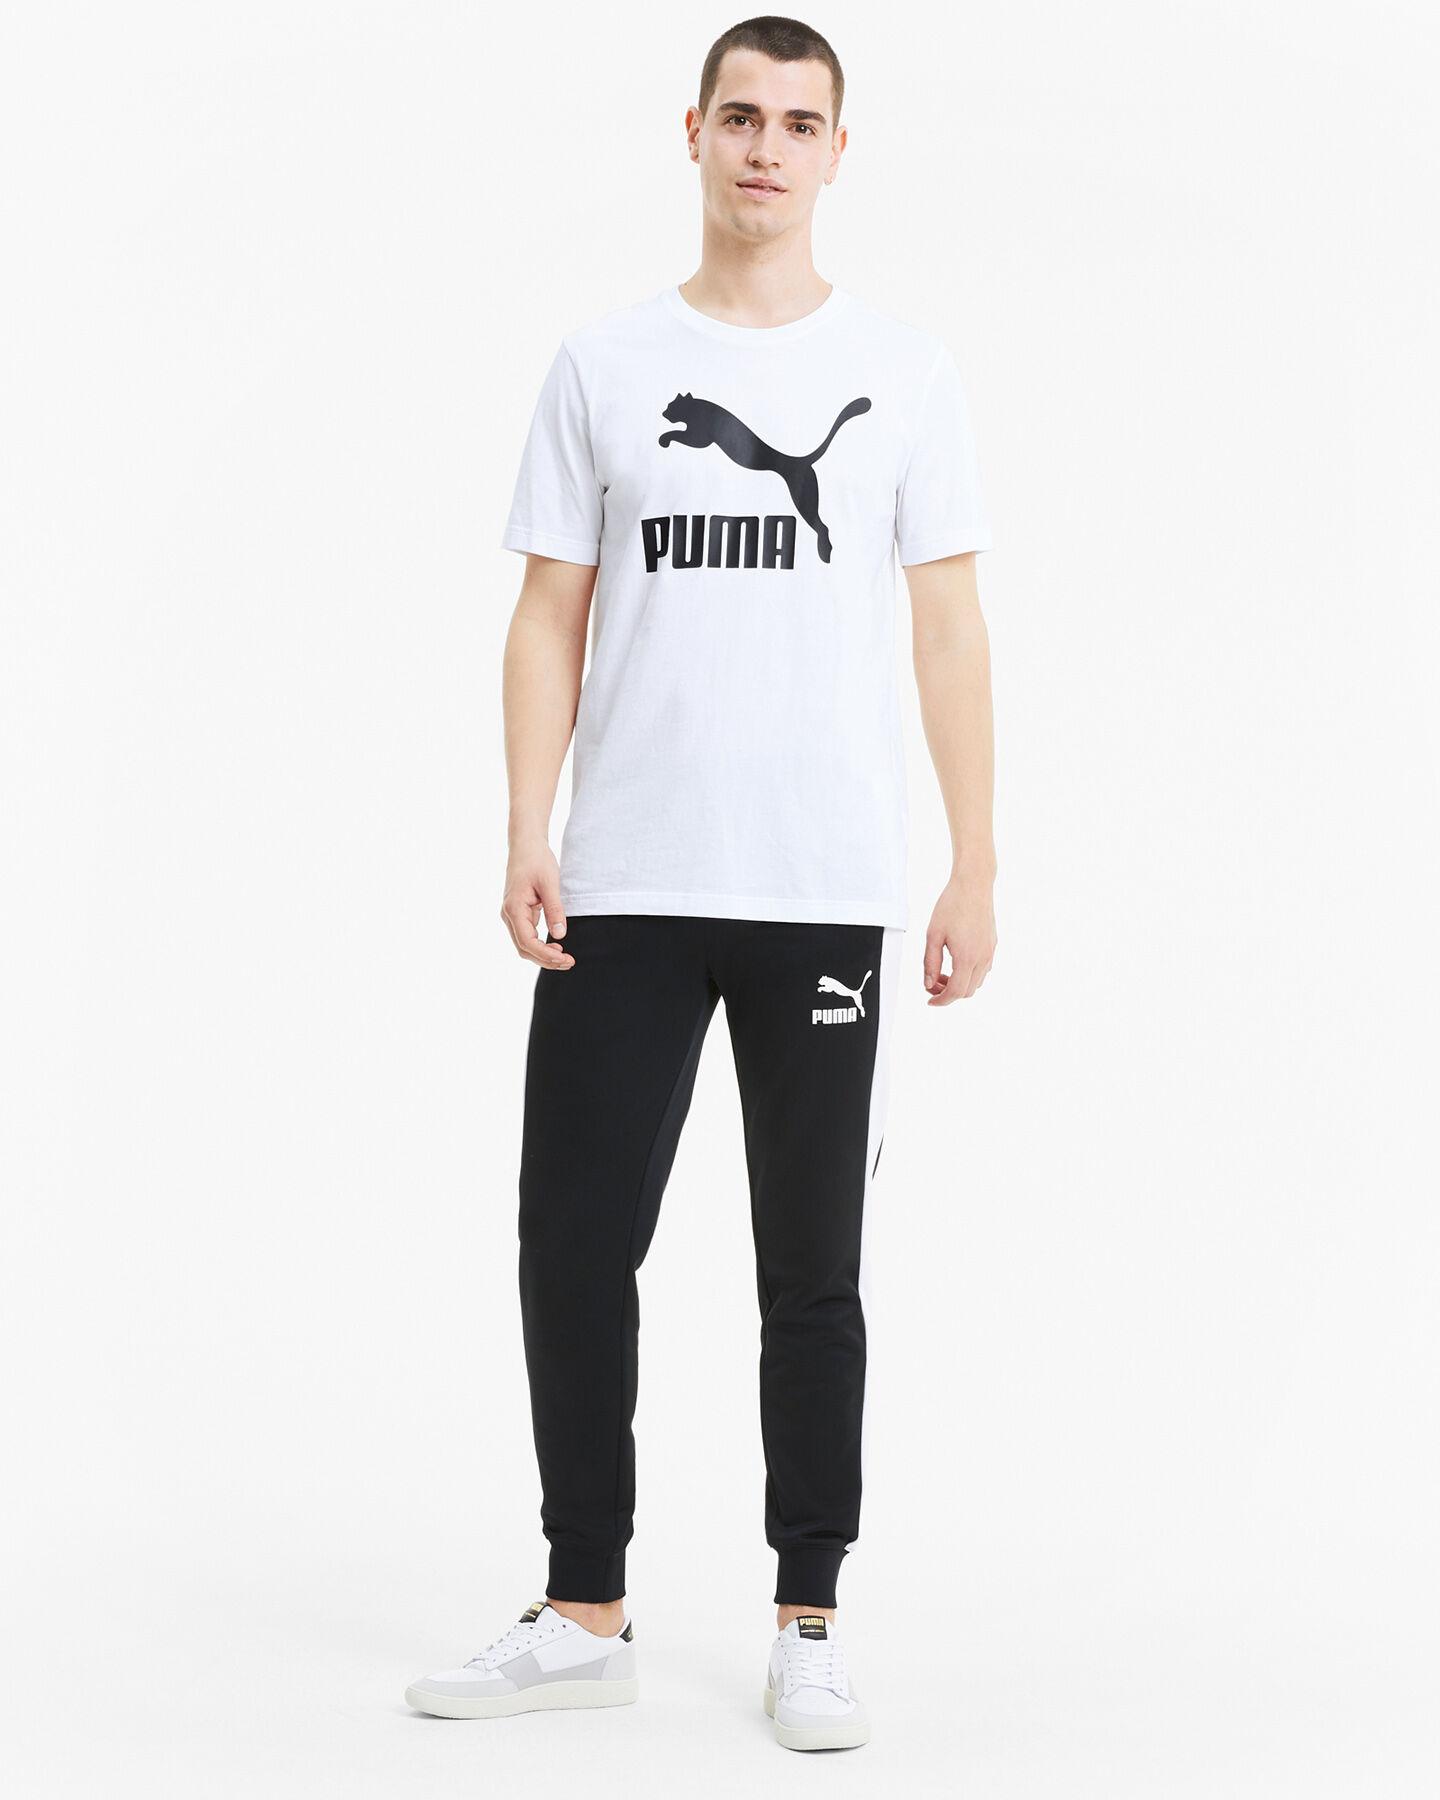 T-Shirt PUMA CLASSIC LOGO M S5235521 scatto 4